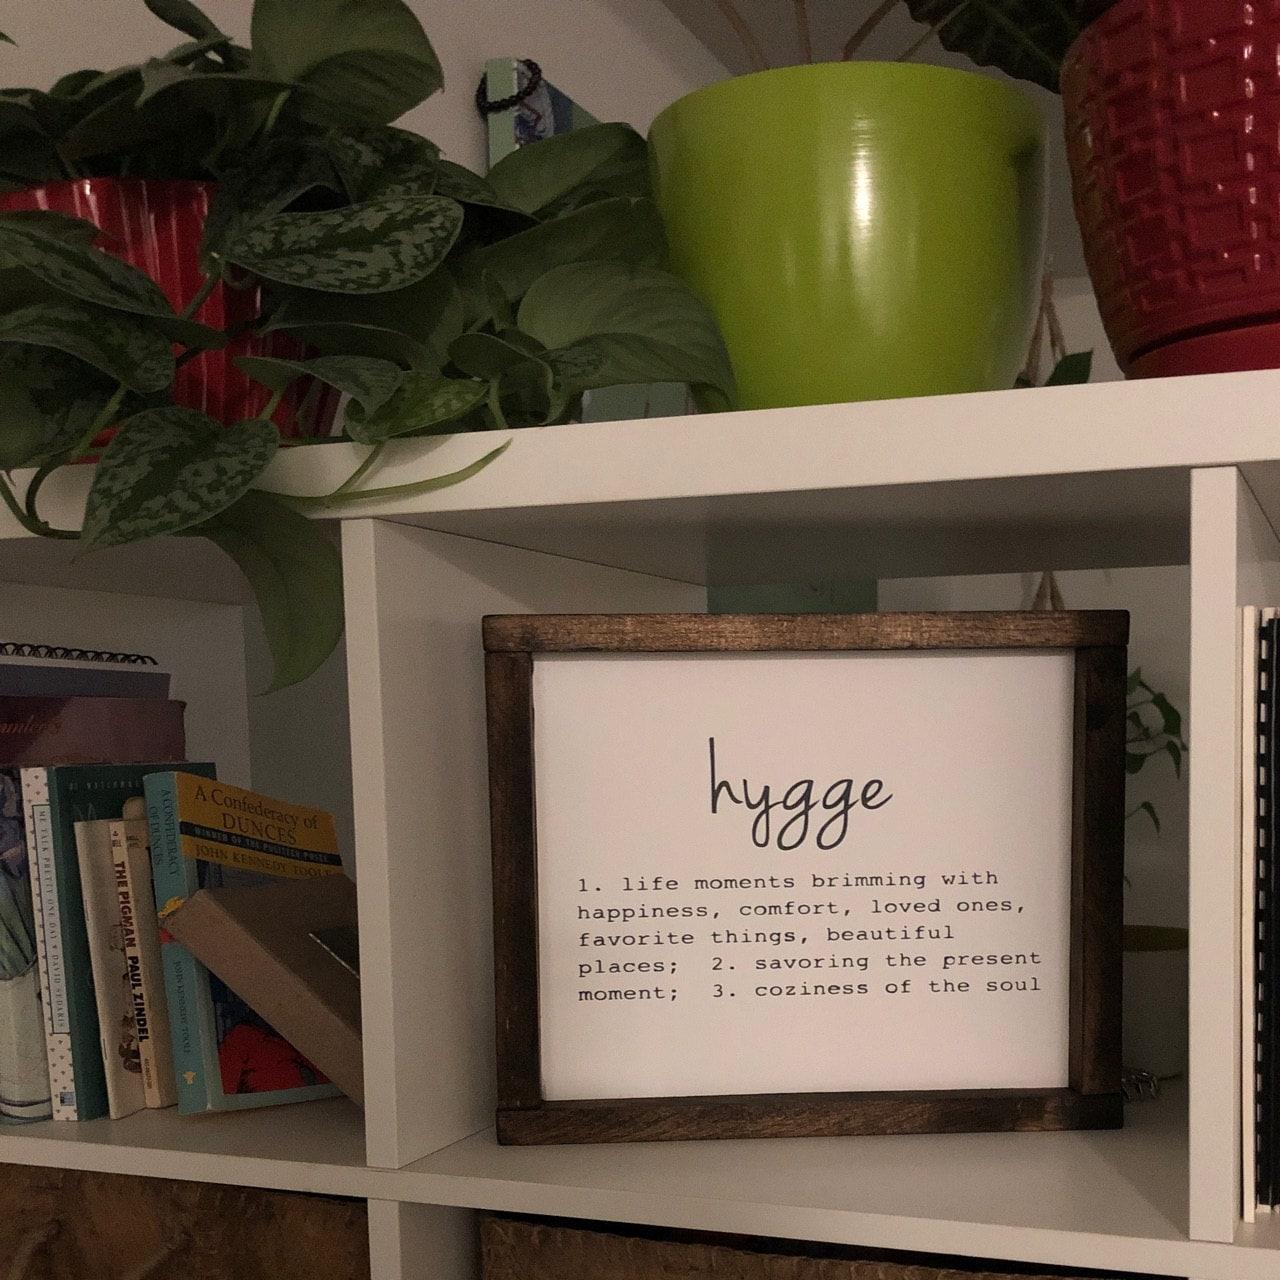 Jody Jarrett added a photo of their purchase